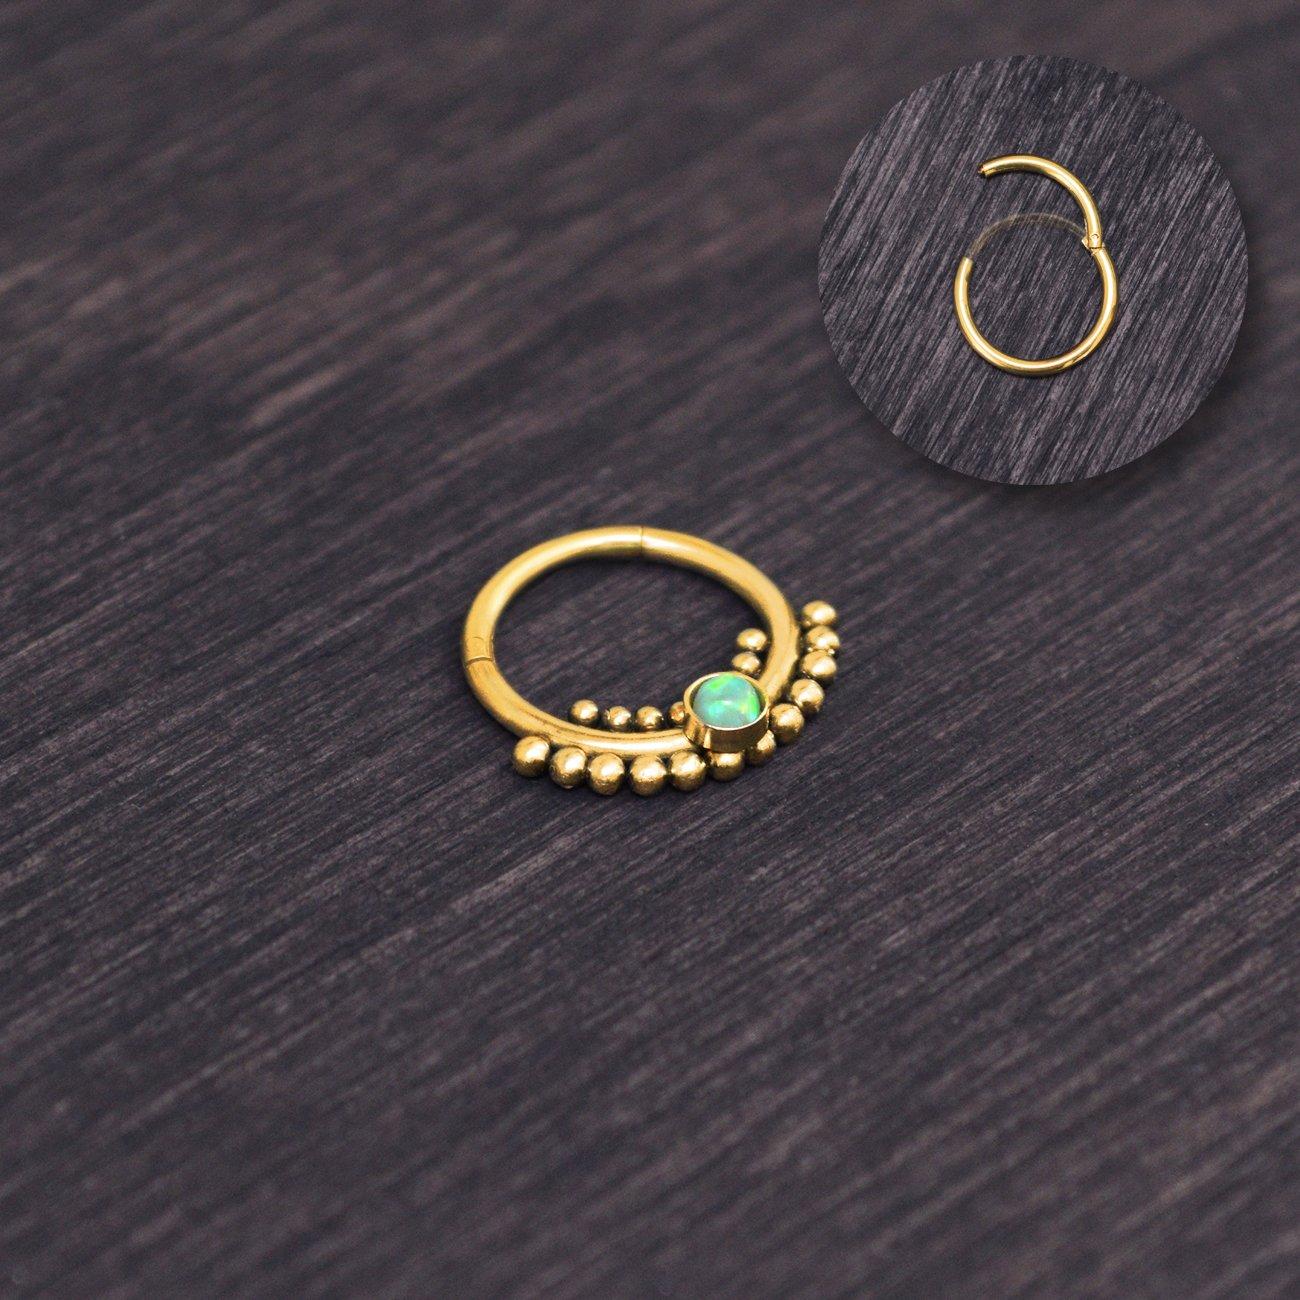 Daith Ring NellySteelPiercing Septum Nose Ring Surgical Steel Septum Hoop